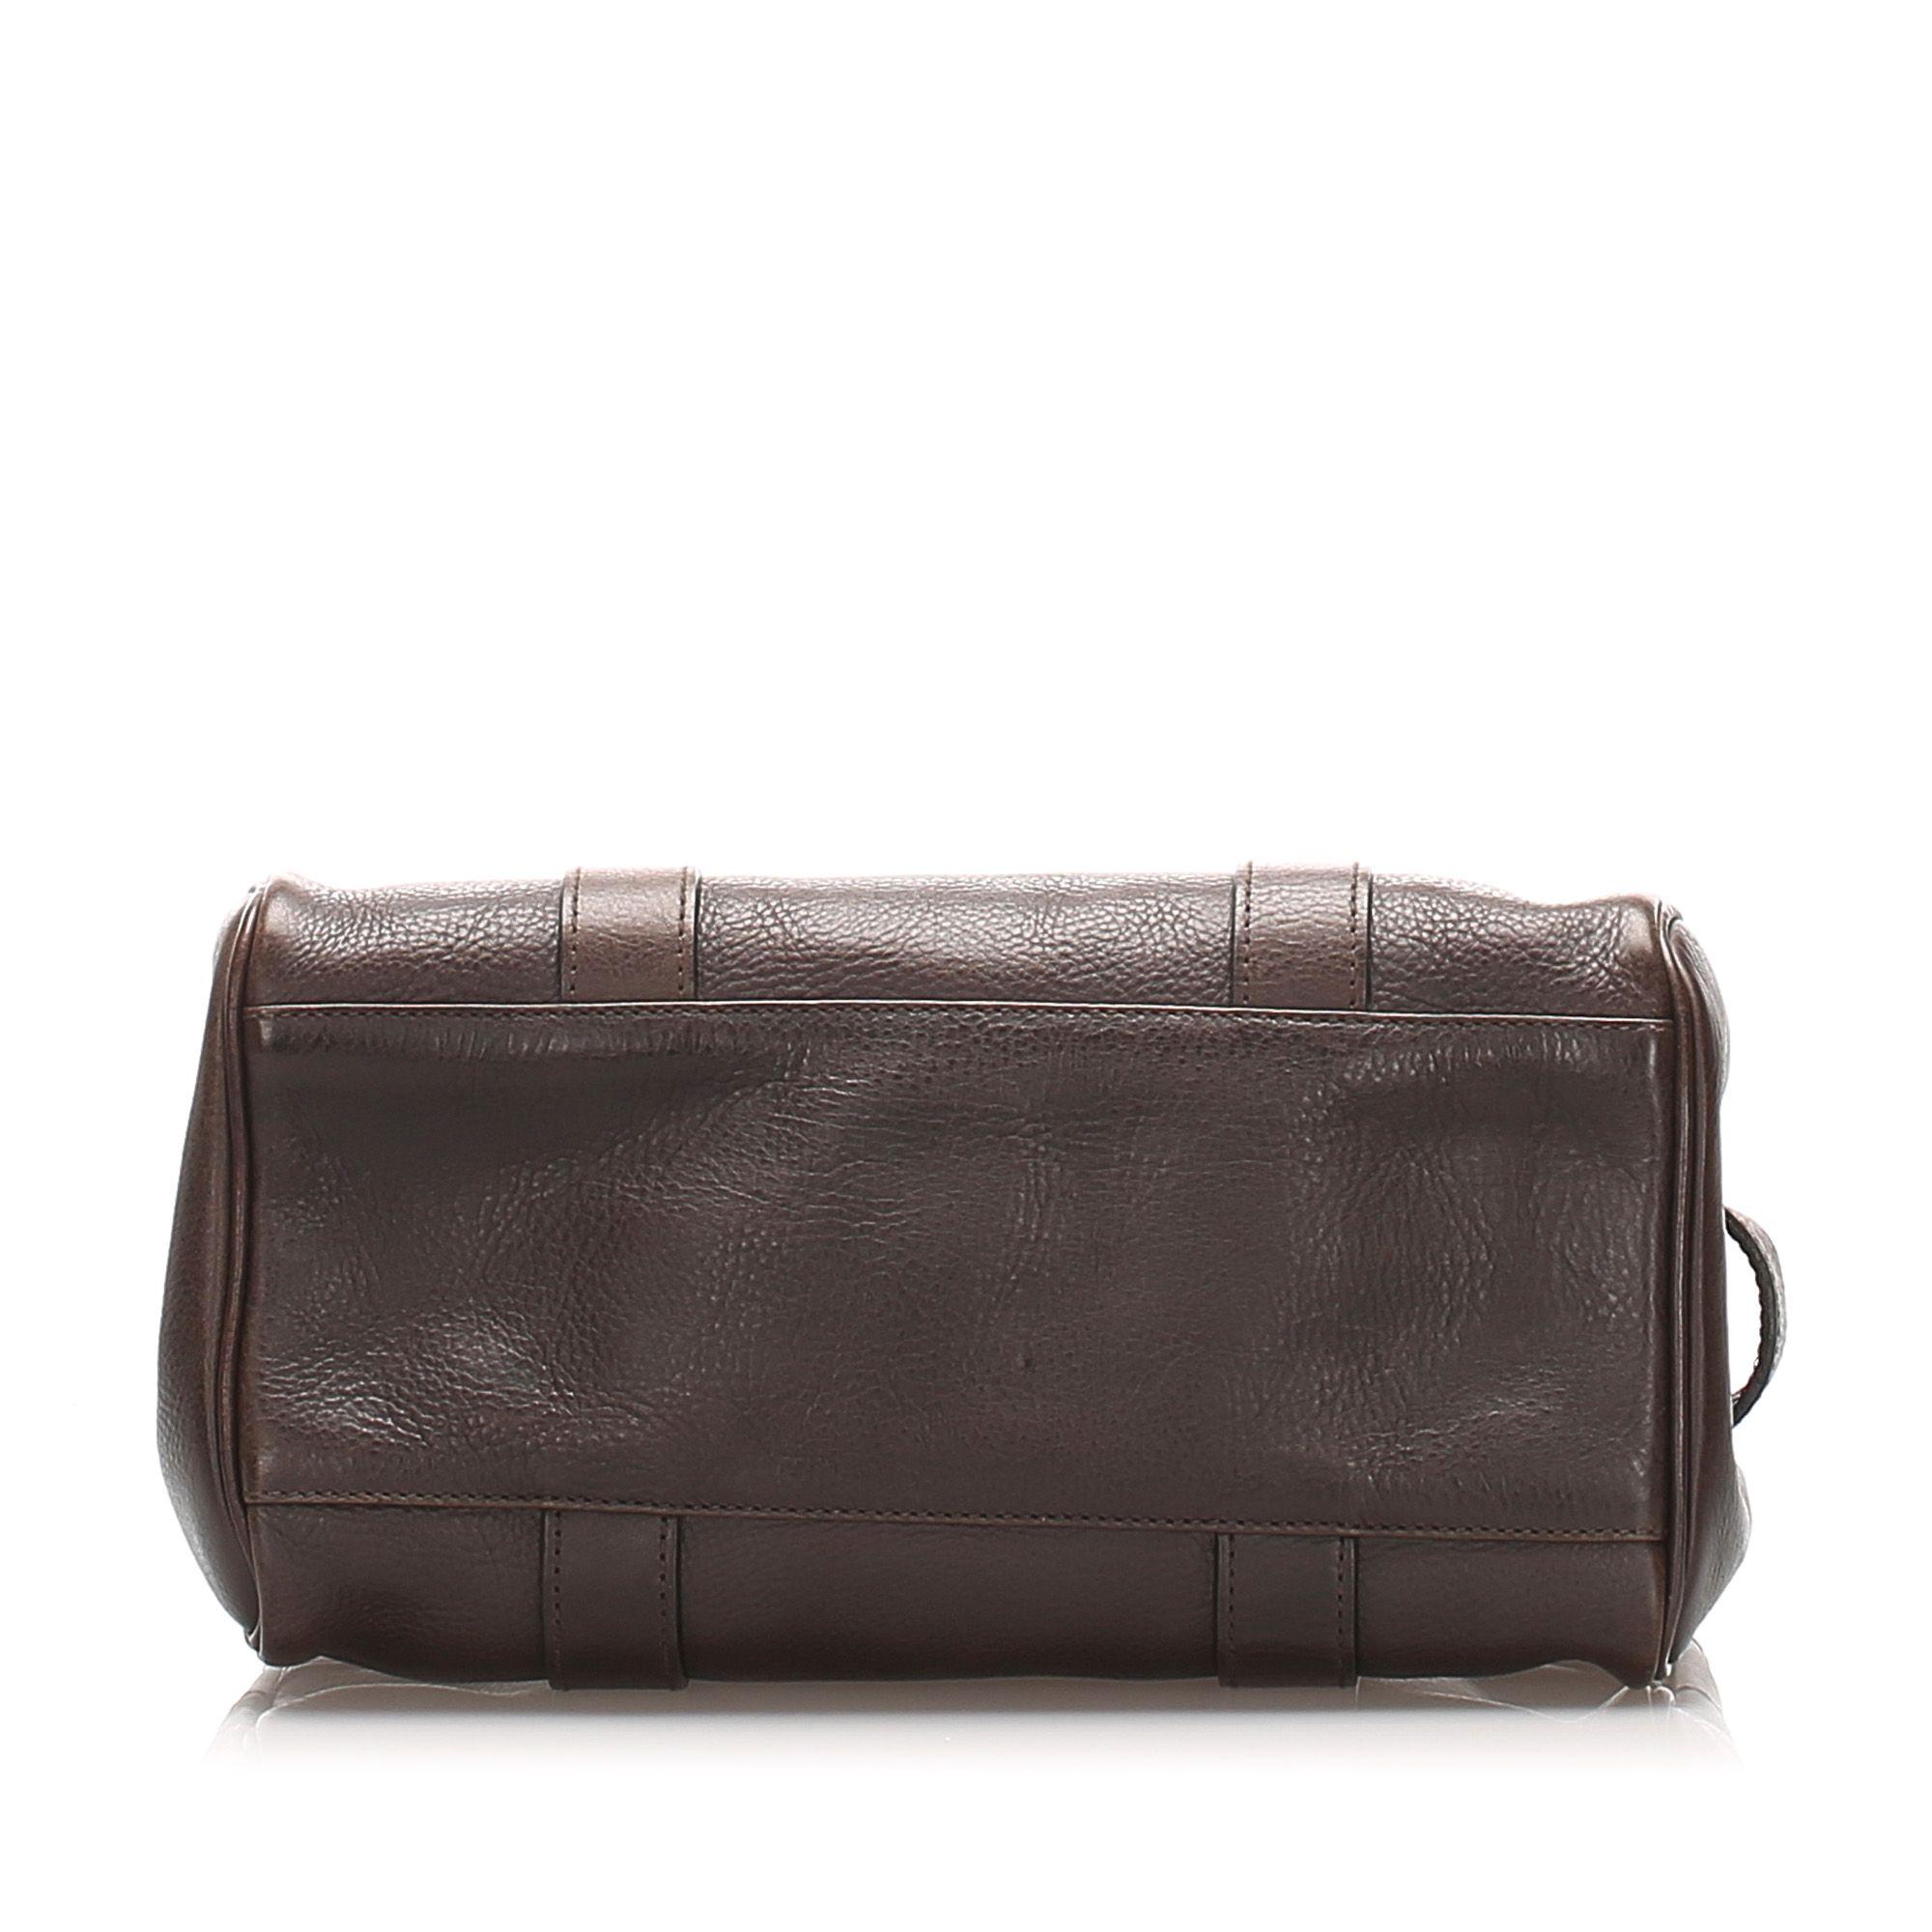 Vintage Mulberry Bayswater Leather Handbag Brown